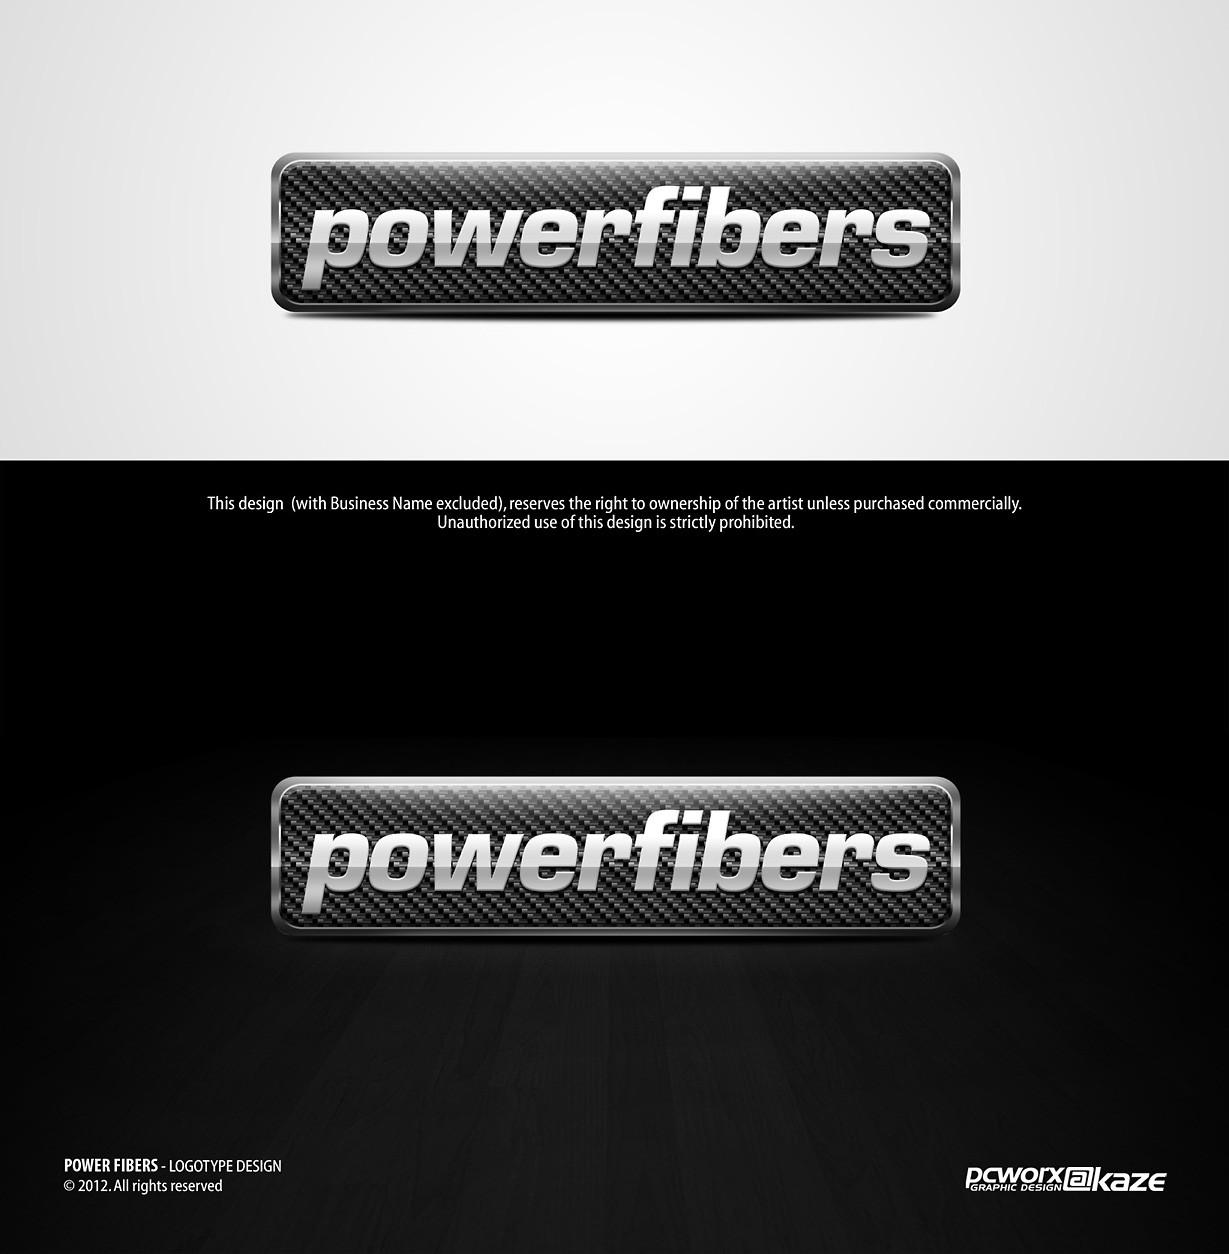 Power fibers needs a new logo